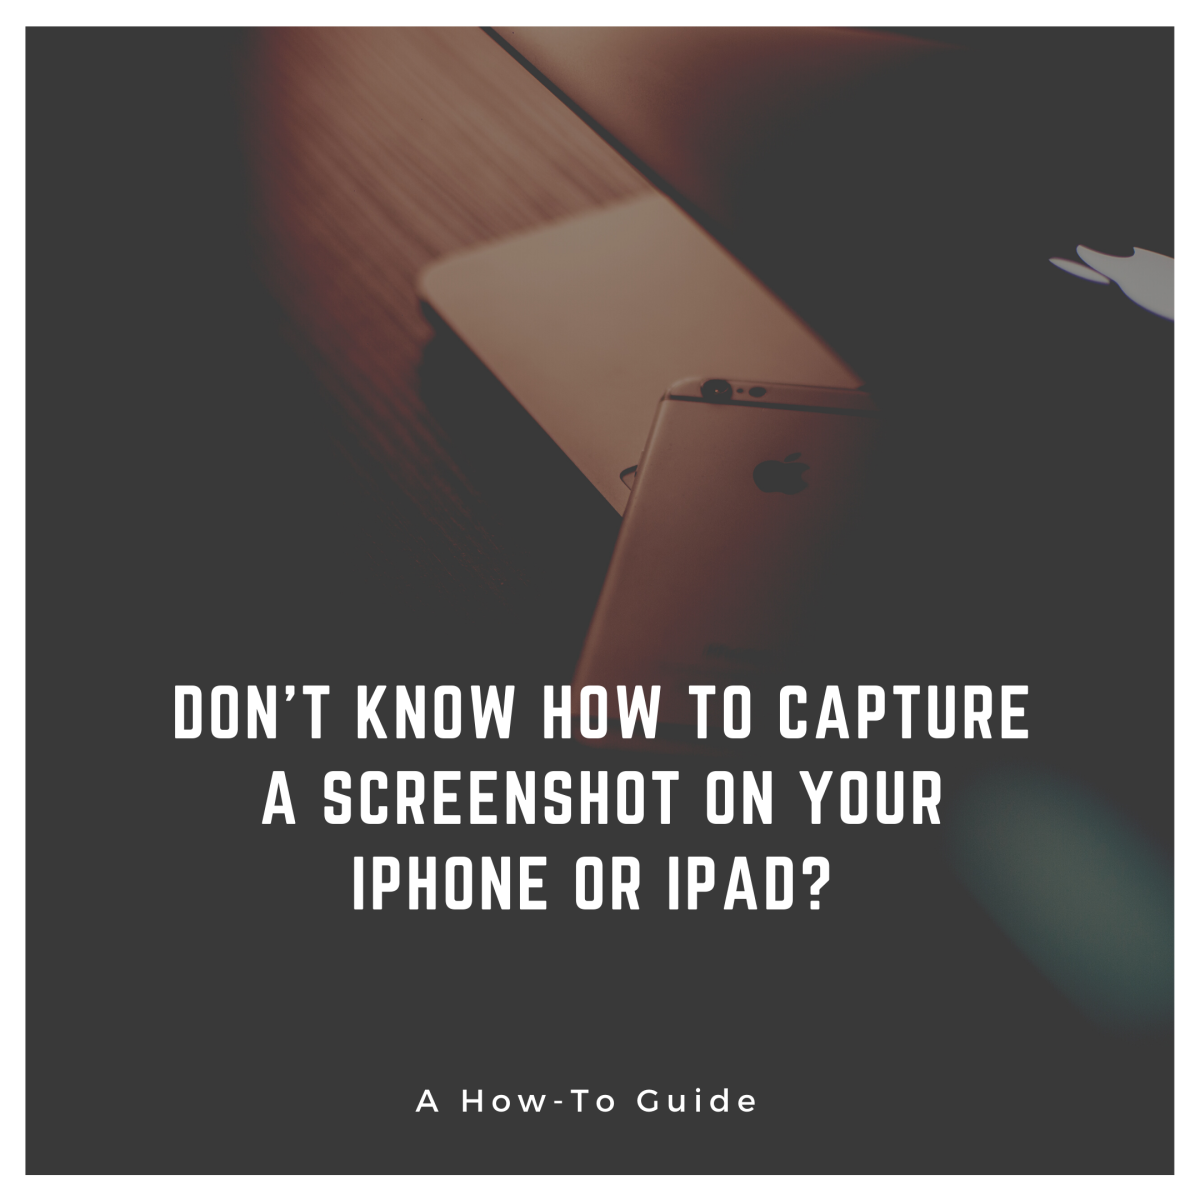 5 Ways to Capture a Screenshot on an Apple iPhone or iPad